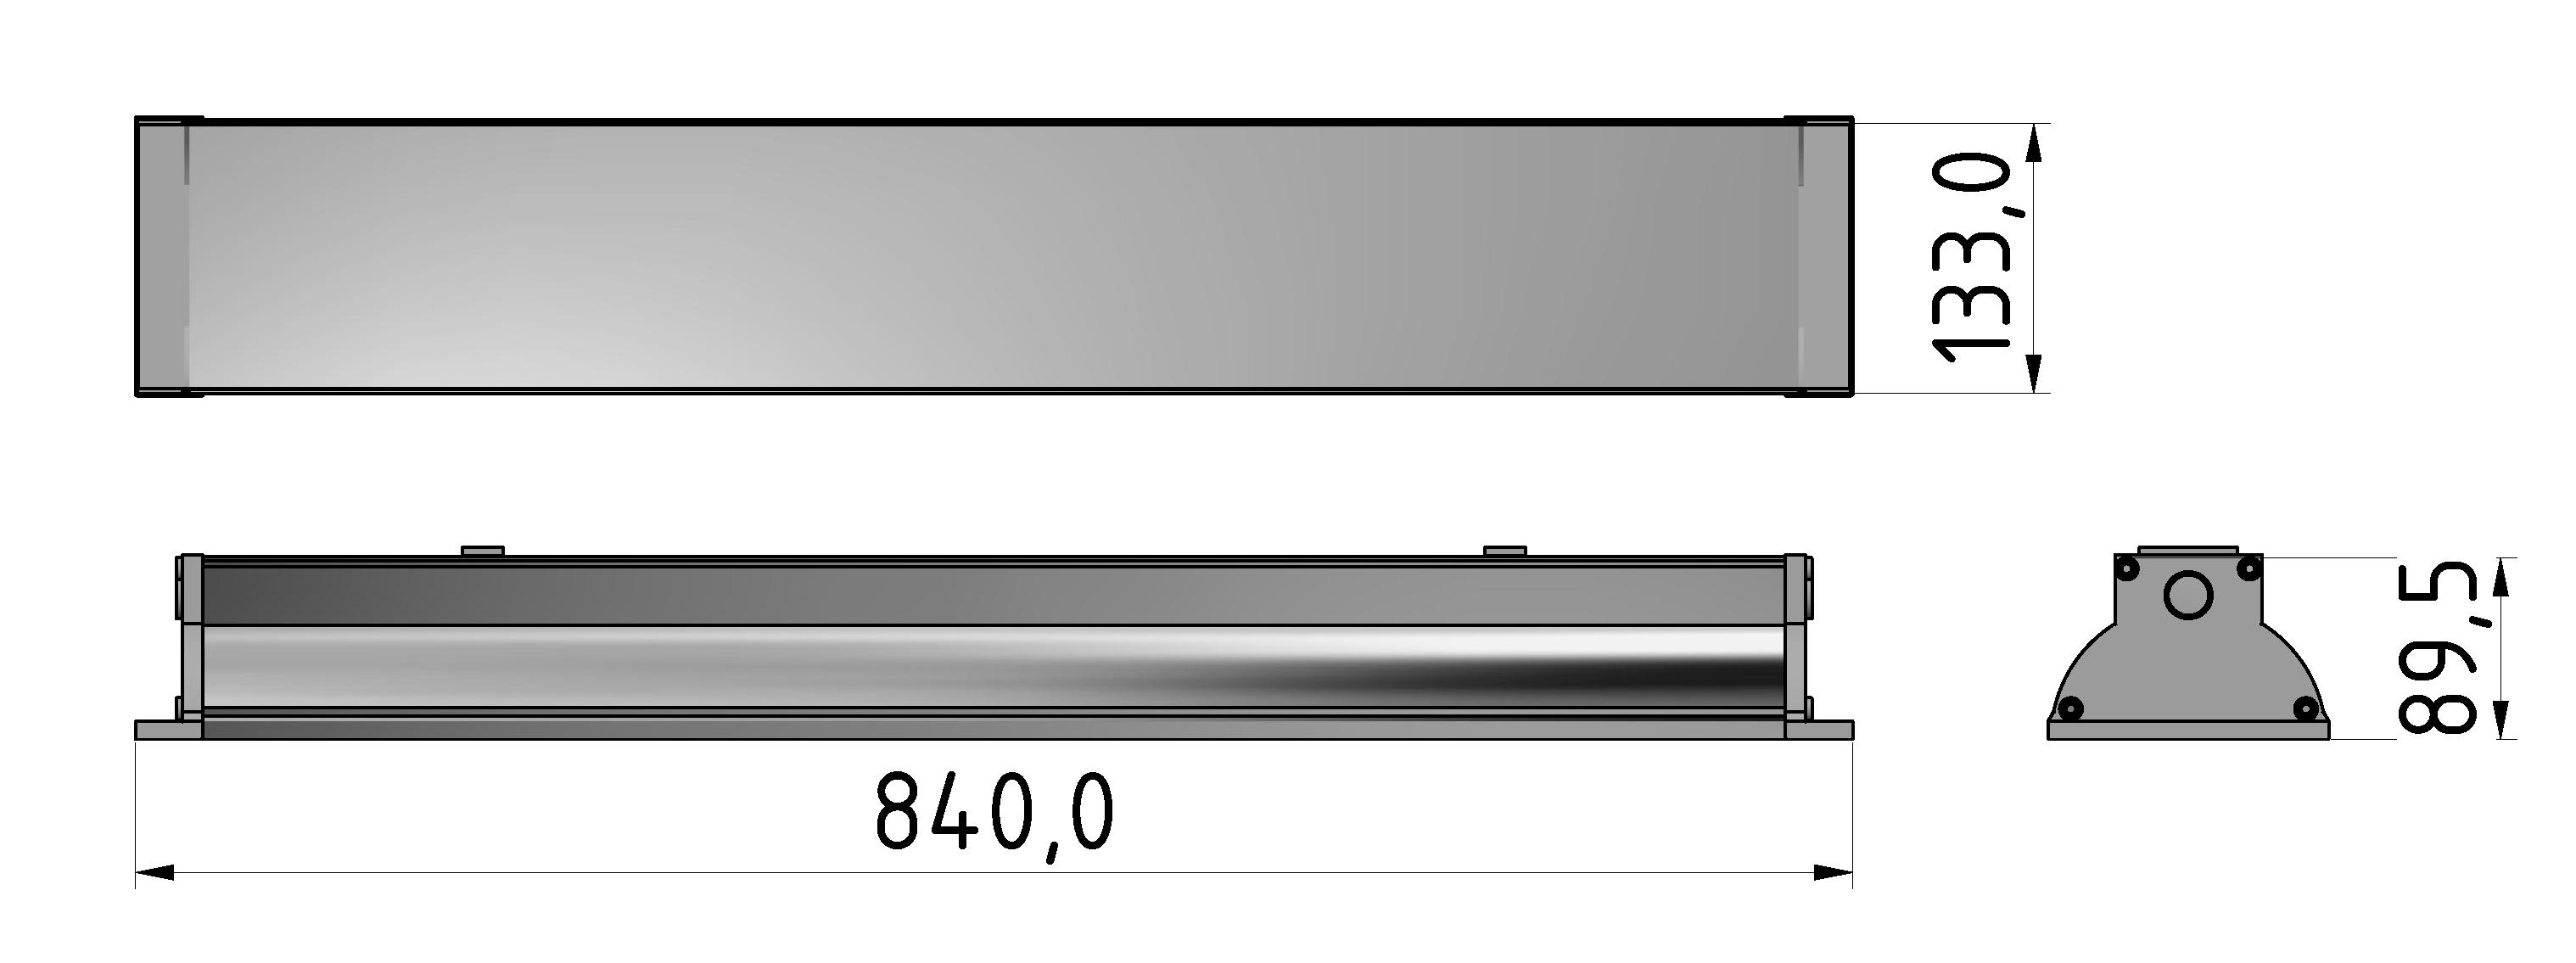 Arbeitsplatzleuchte LED 840 I P65